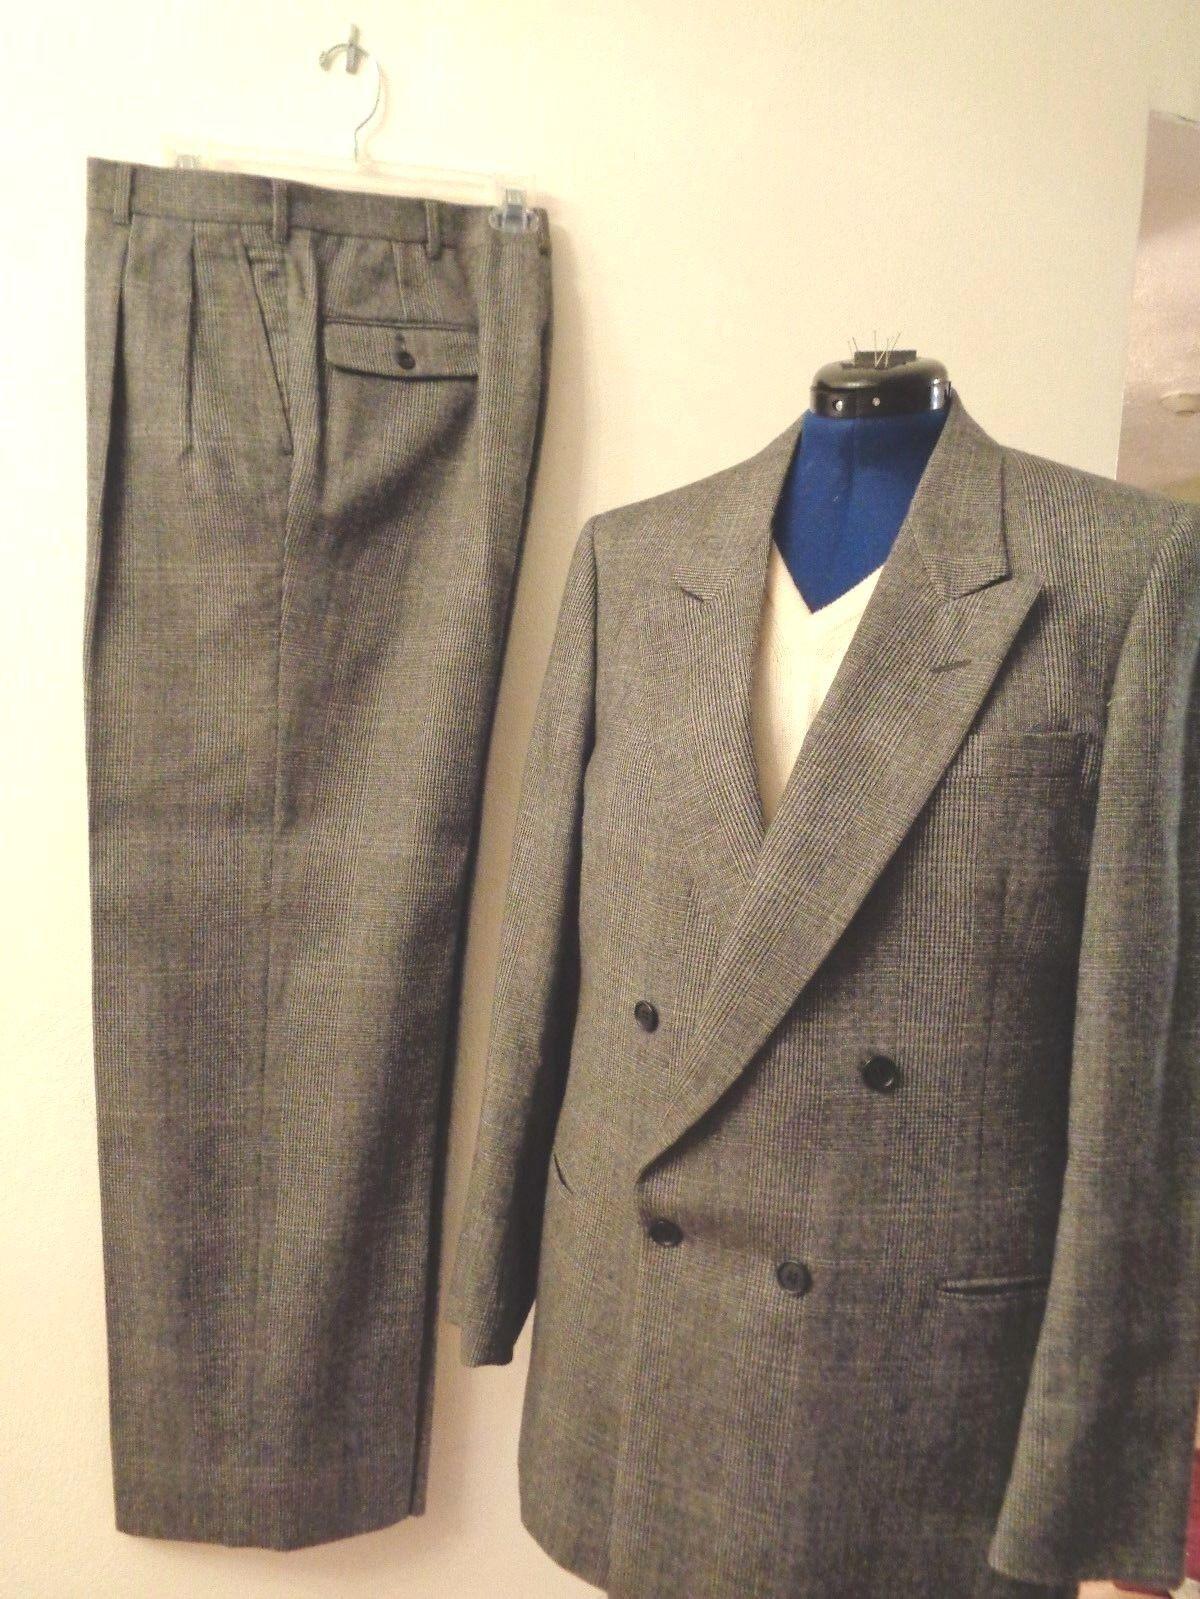 Men's Pierre Cardin suit, dark light grey houndstooth 100% wool,d b, size 42 l